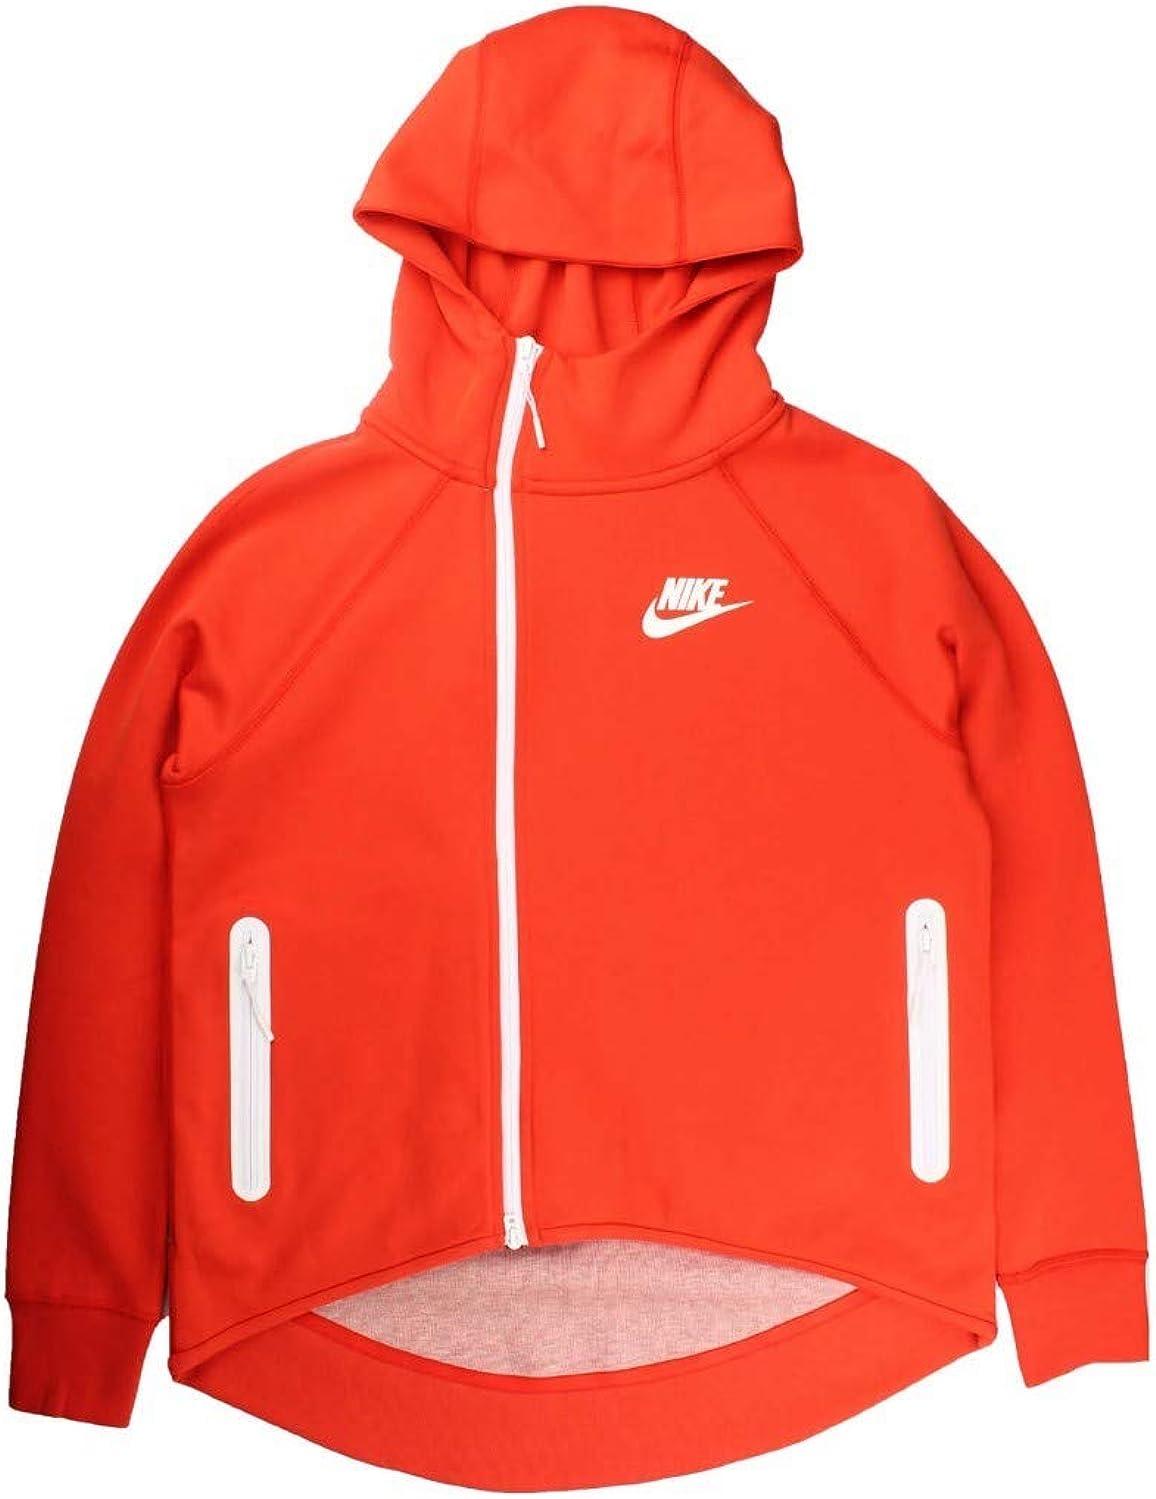 Nike Sportswear Tech Fleece Full Zip Cape Women S Hoodie Habanero Red Size Xl 930757 634 At Amazon Women S Clothing Store